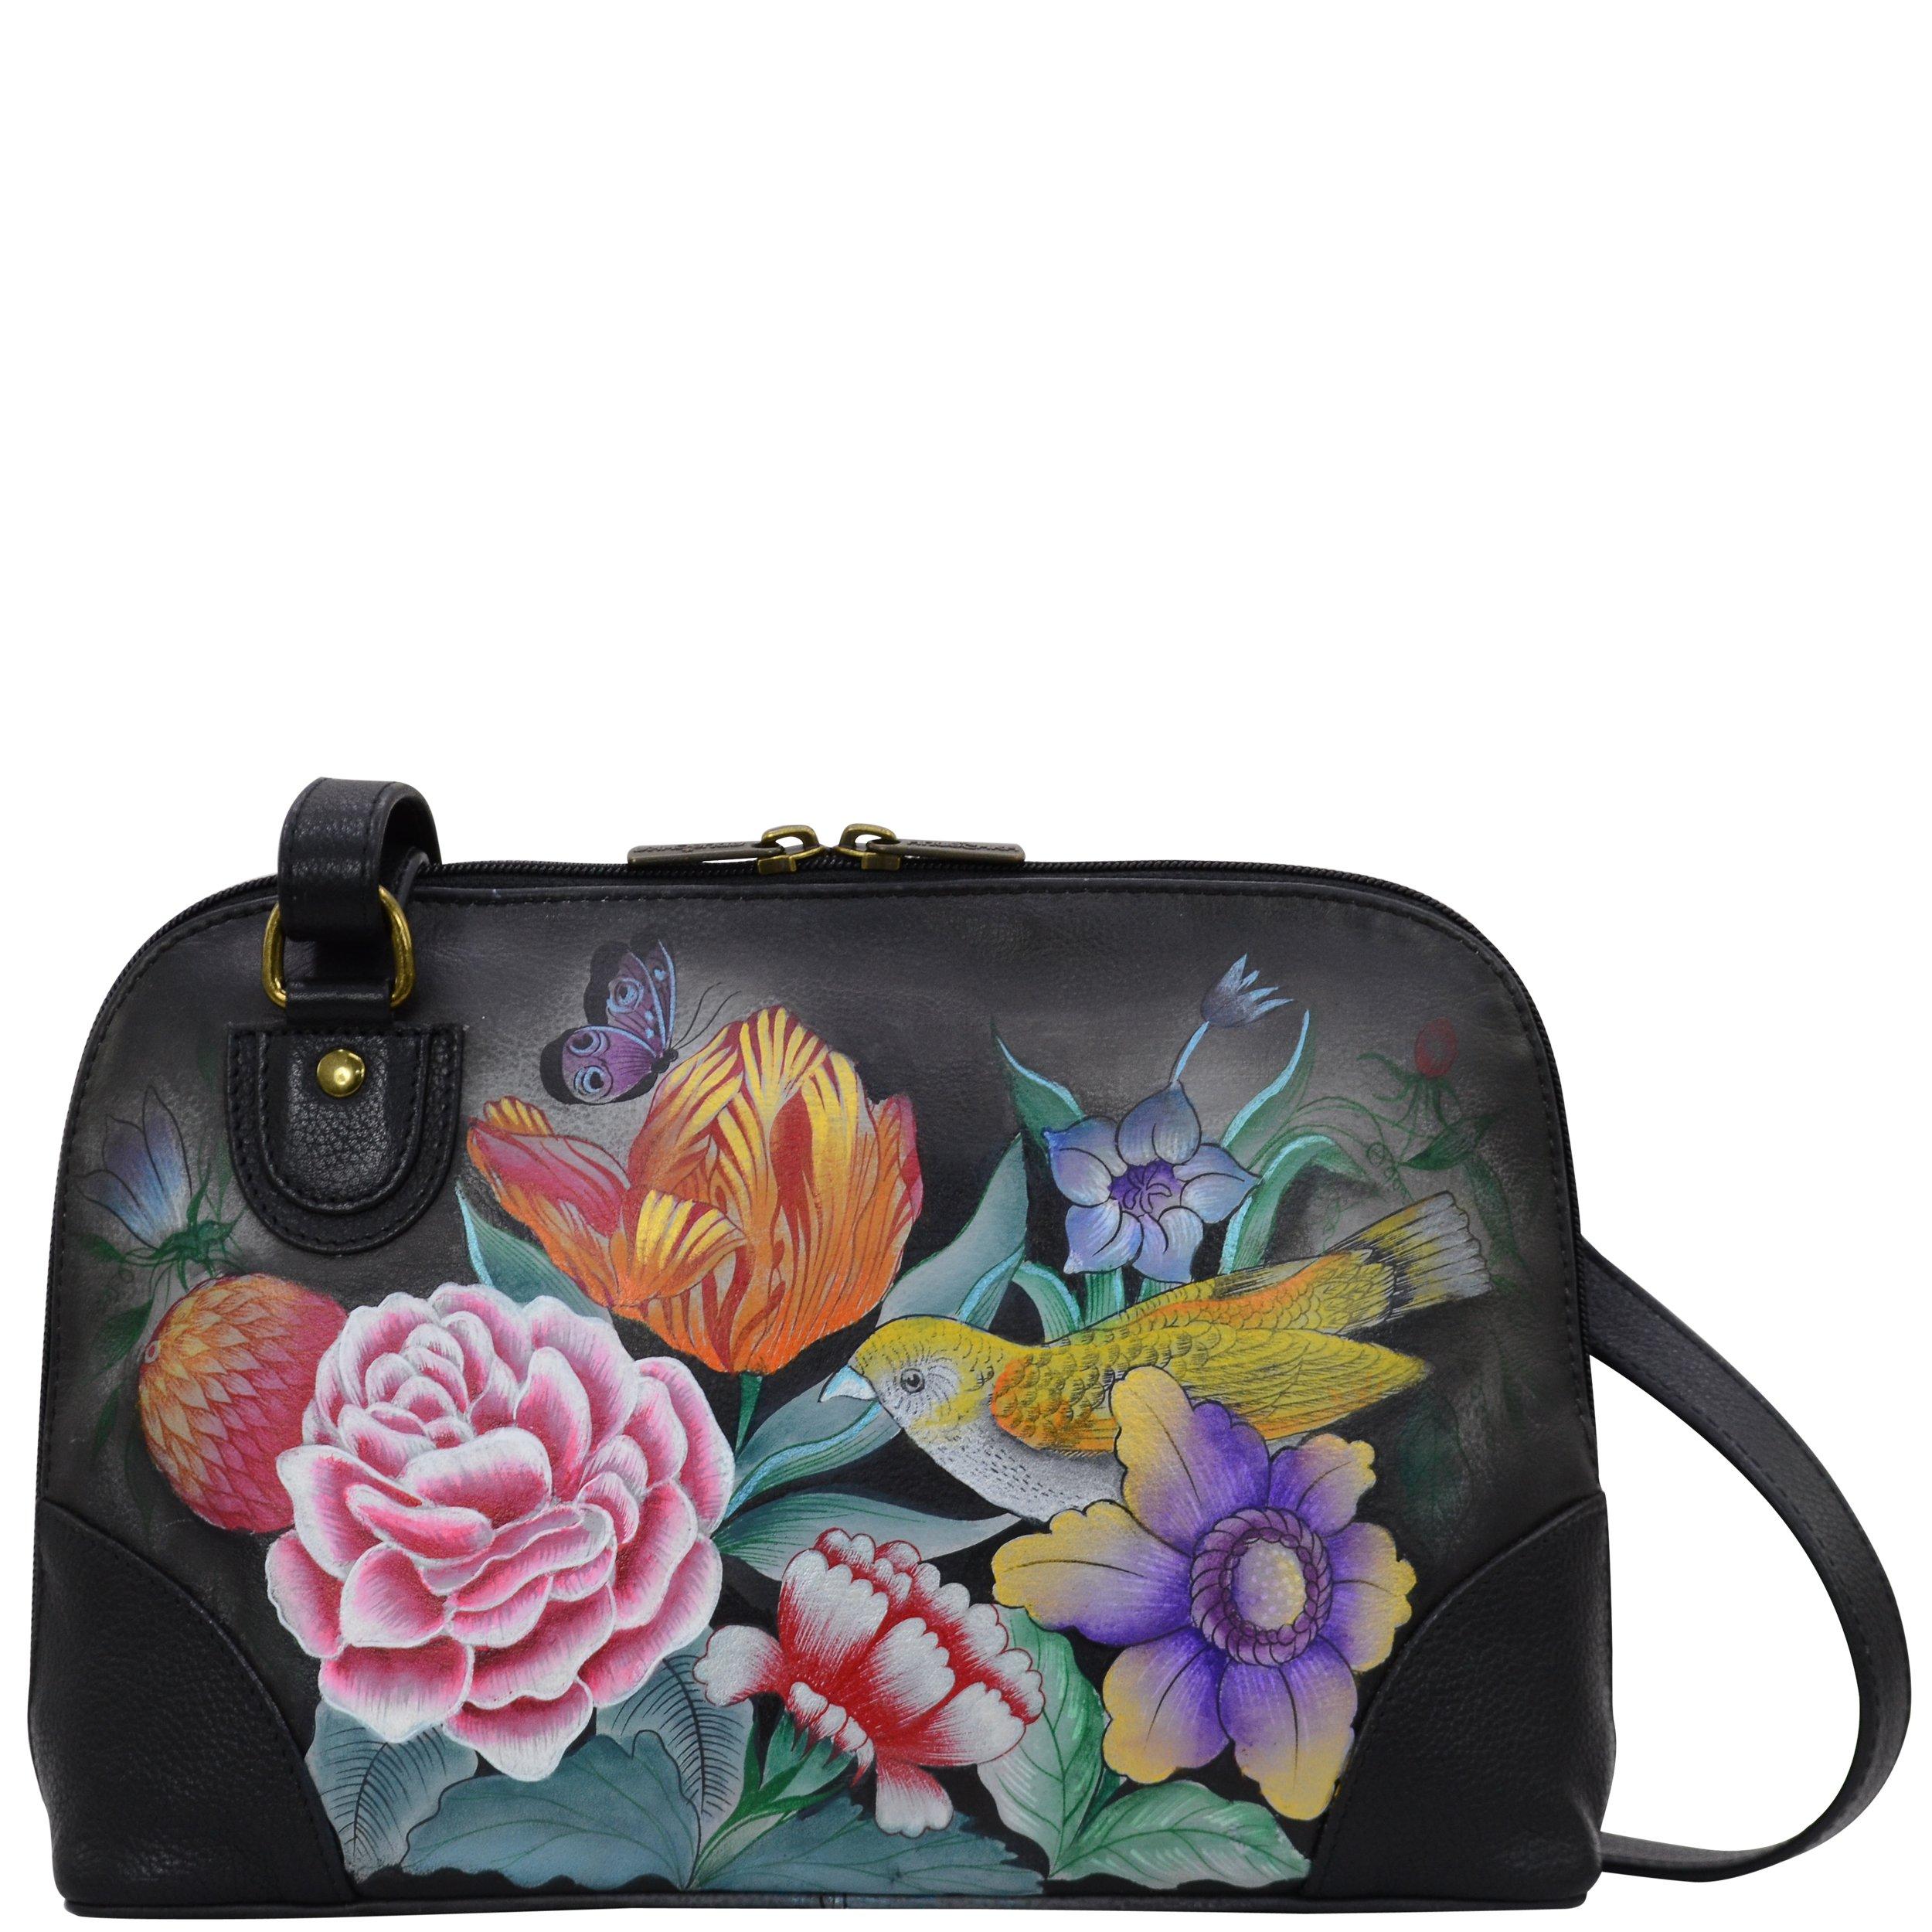 Anuschka Hand Painted Designer Leather Handbag-Christmas gifts for women-Multi Compartment Zip-Around organiser (Vintage Bouquet 531 VBQ)